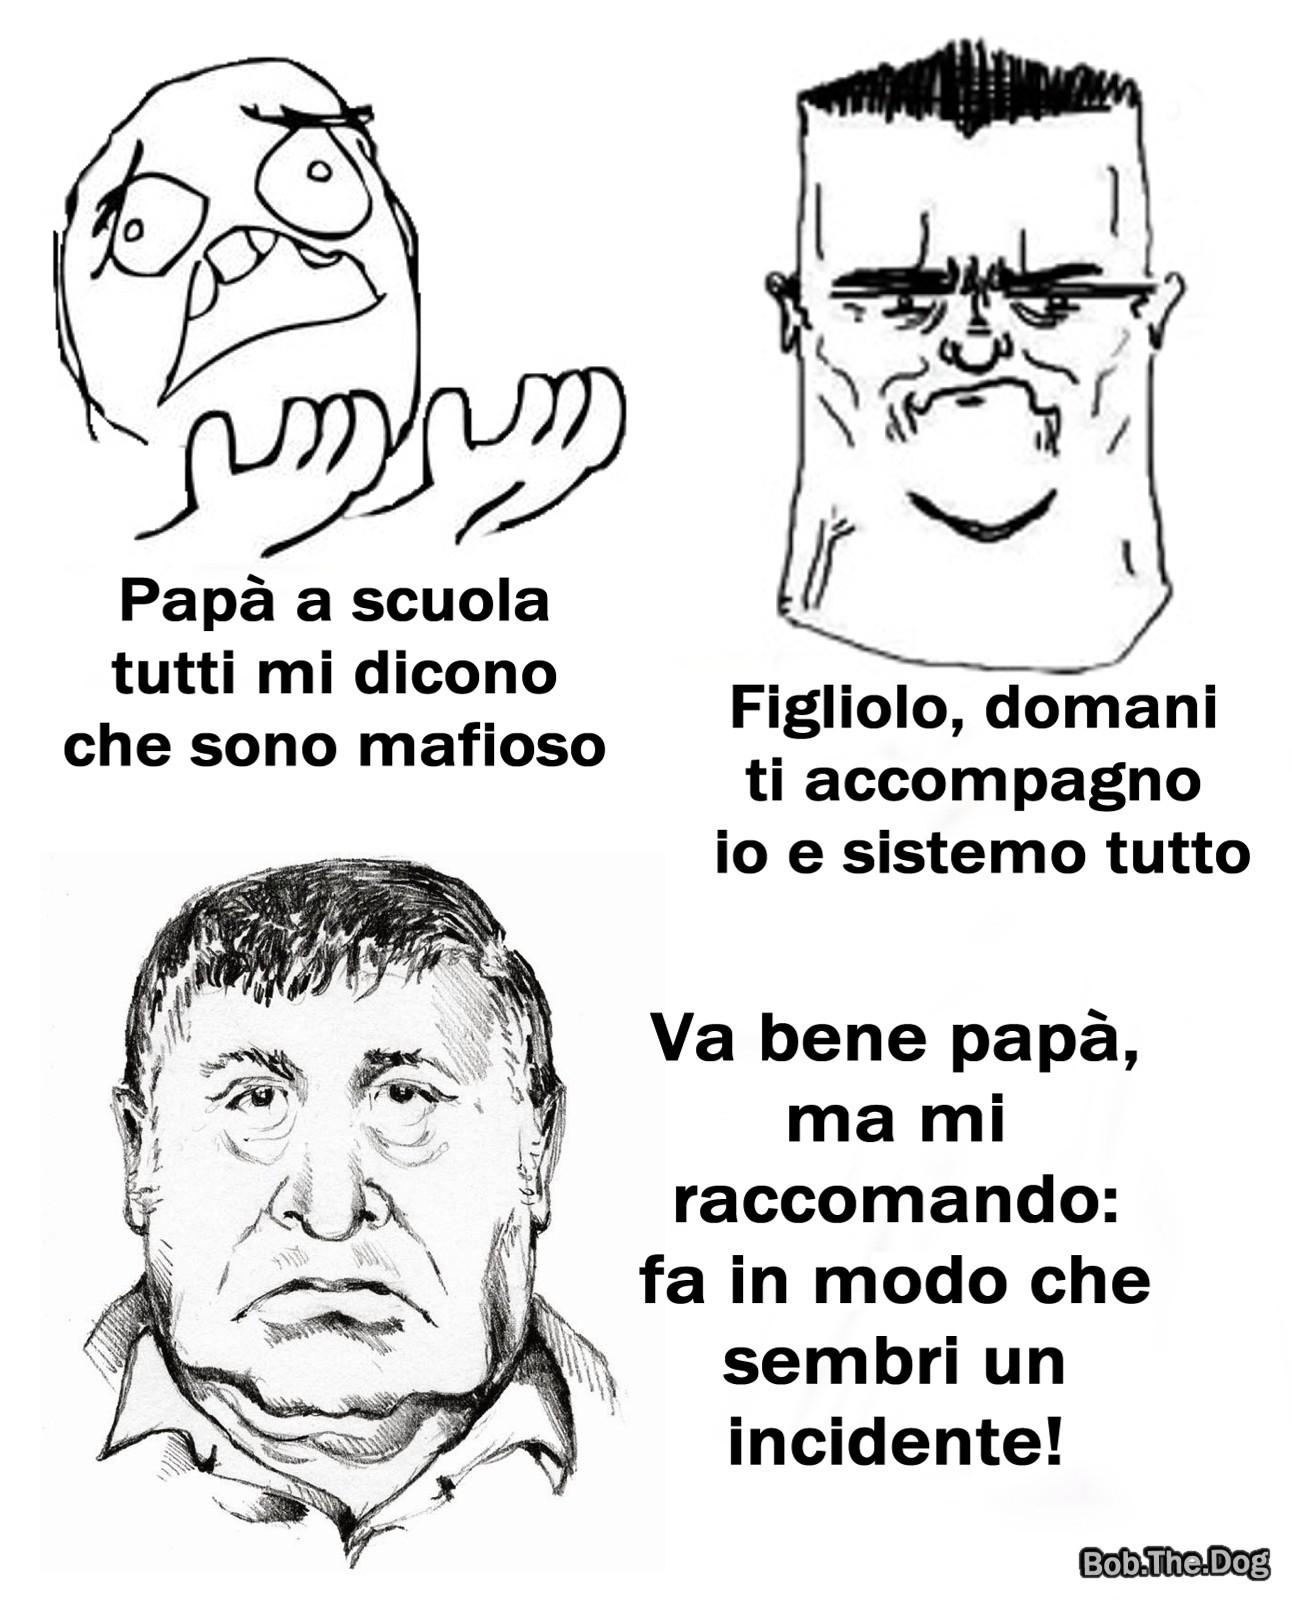 Totò Riina story - meme